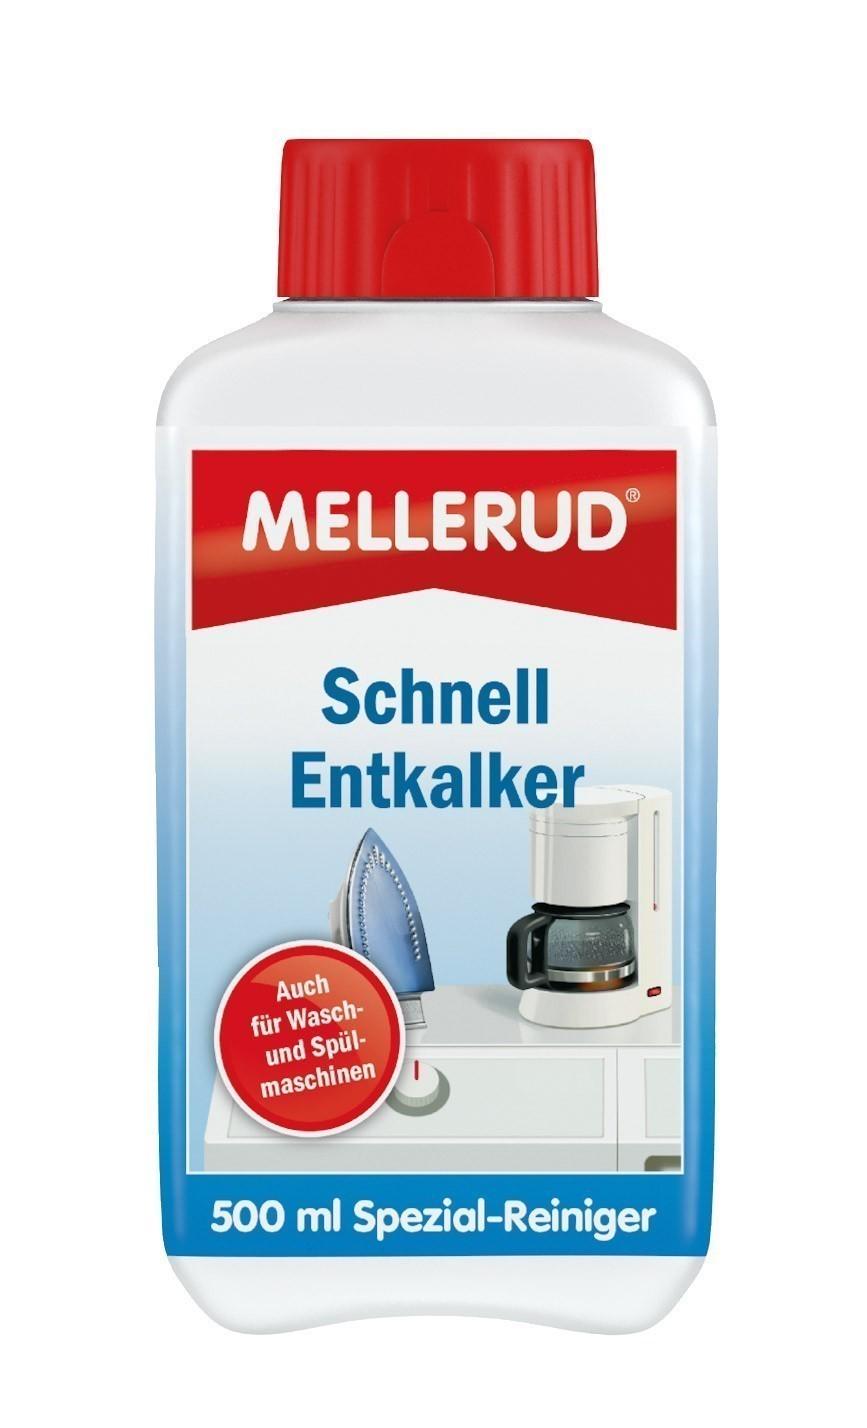 MELLERUD Schnell Entkalker 0,5 Liter Bild 1